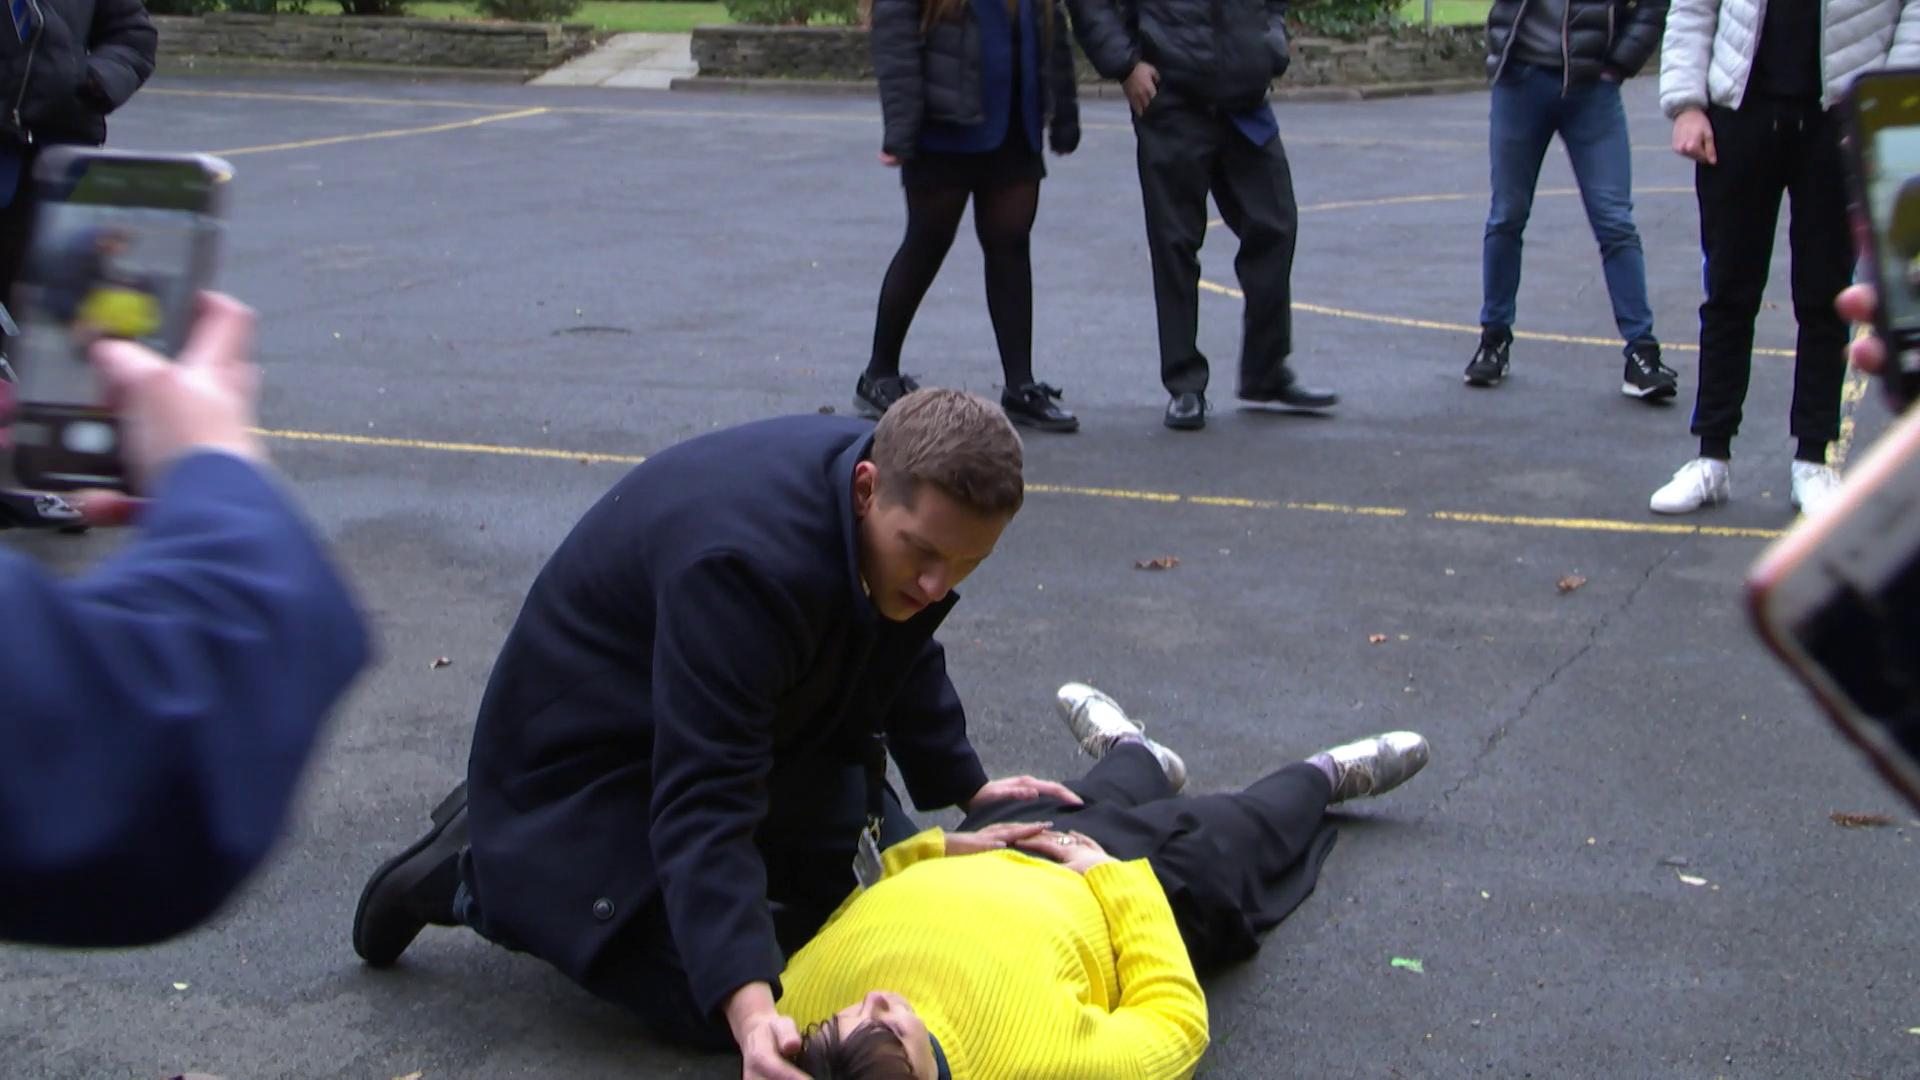 Hollyoaks' Nancy Osborne faces stabbing horror in 11 new spoiler pictures